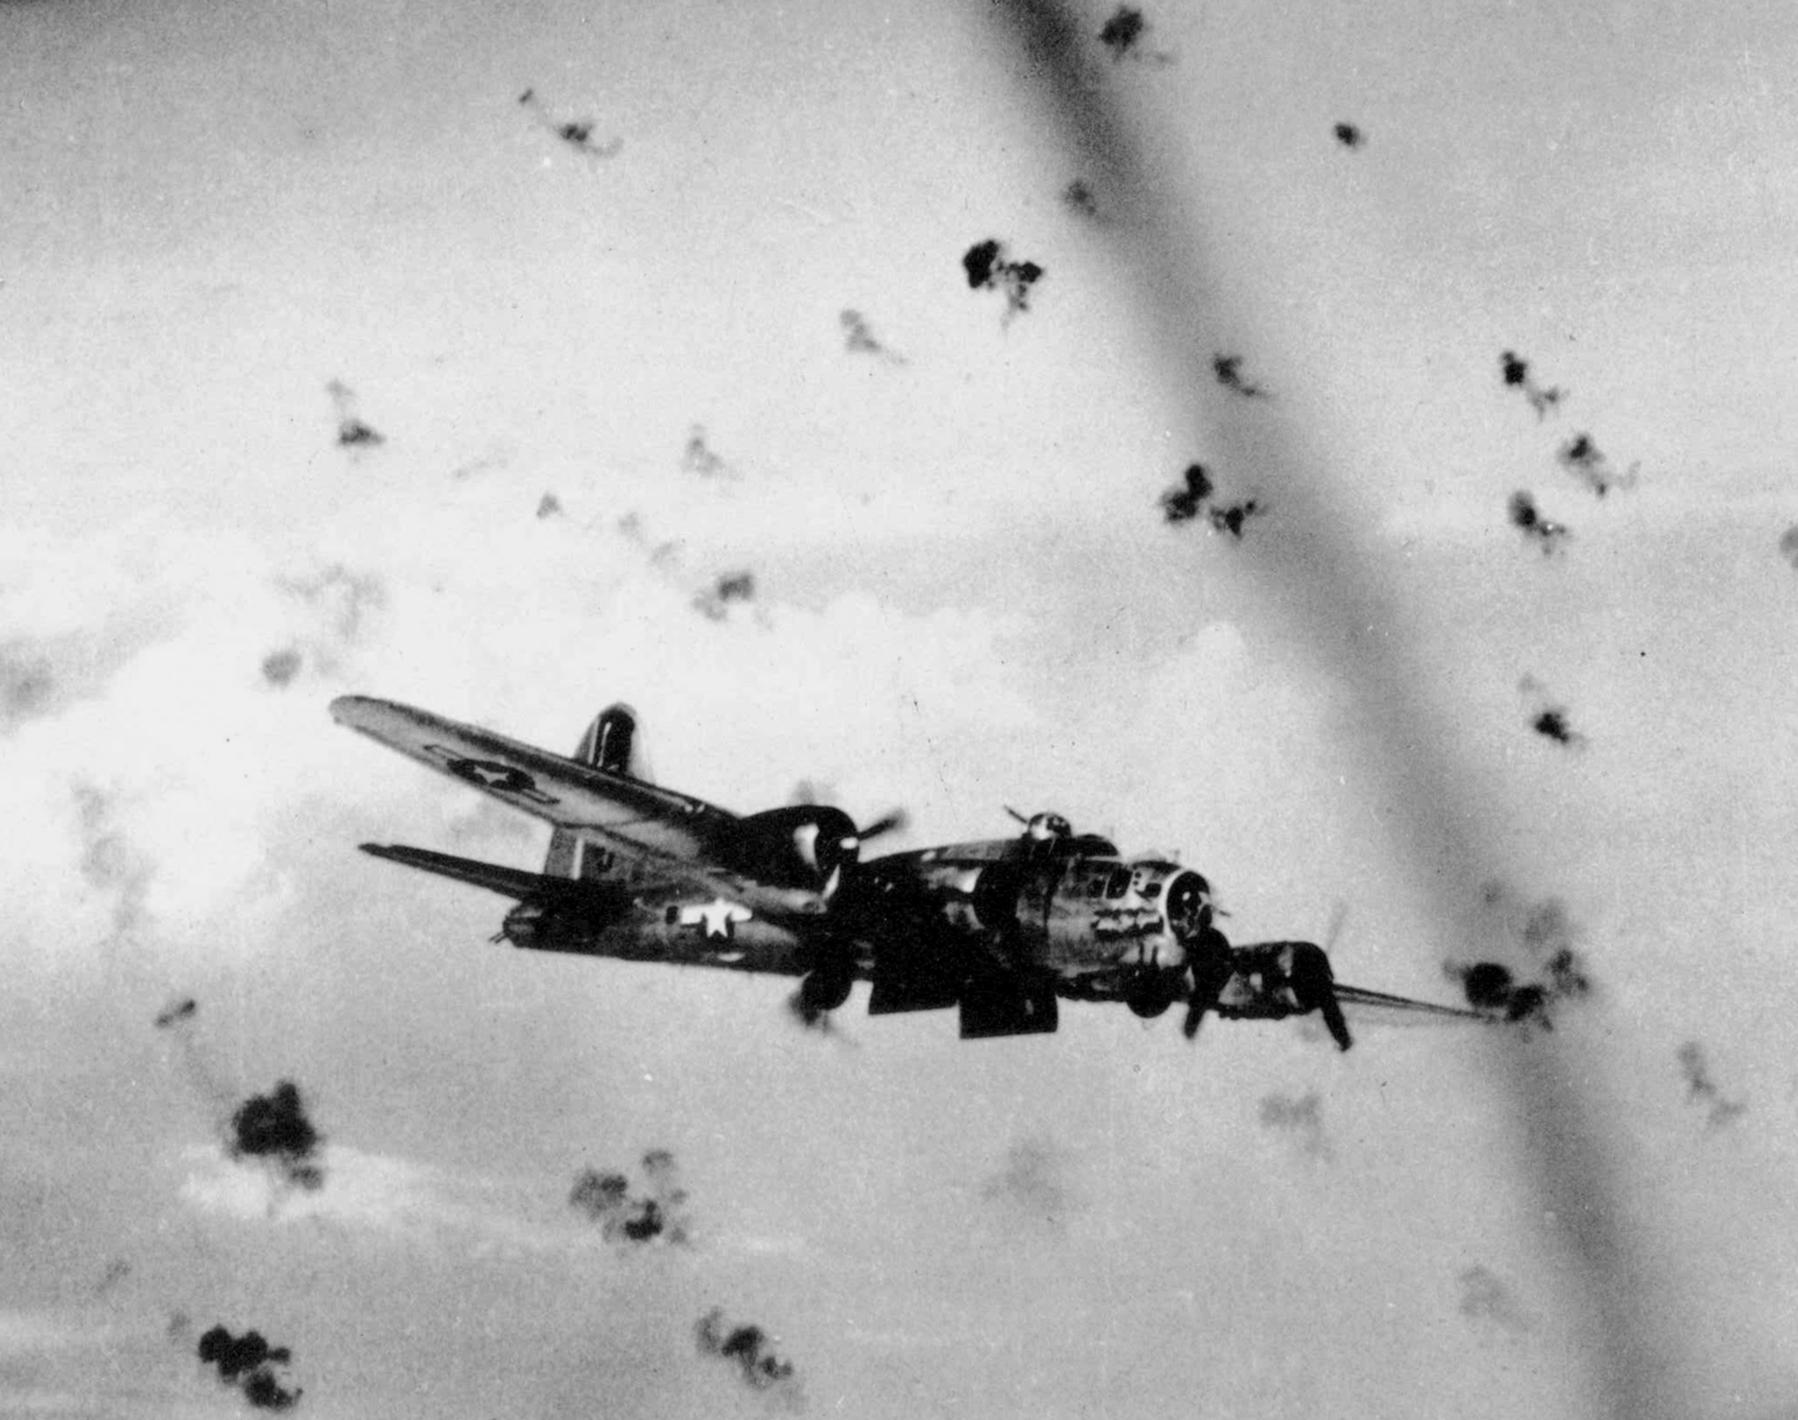 B-17 #43-37563 / Lady Be Good